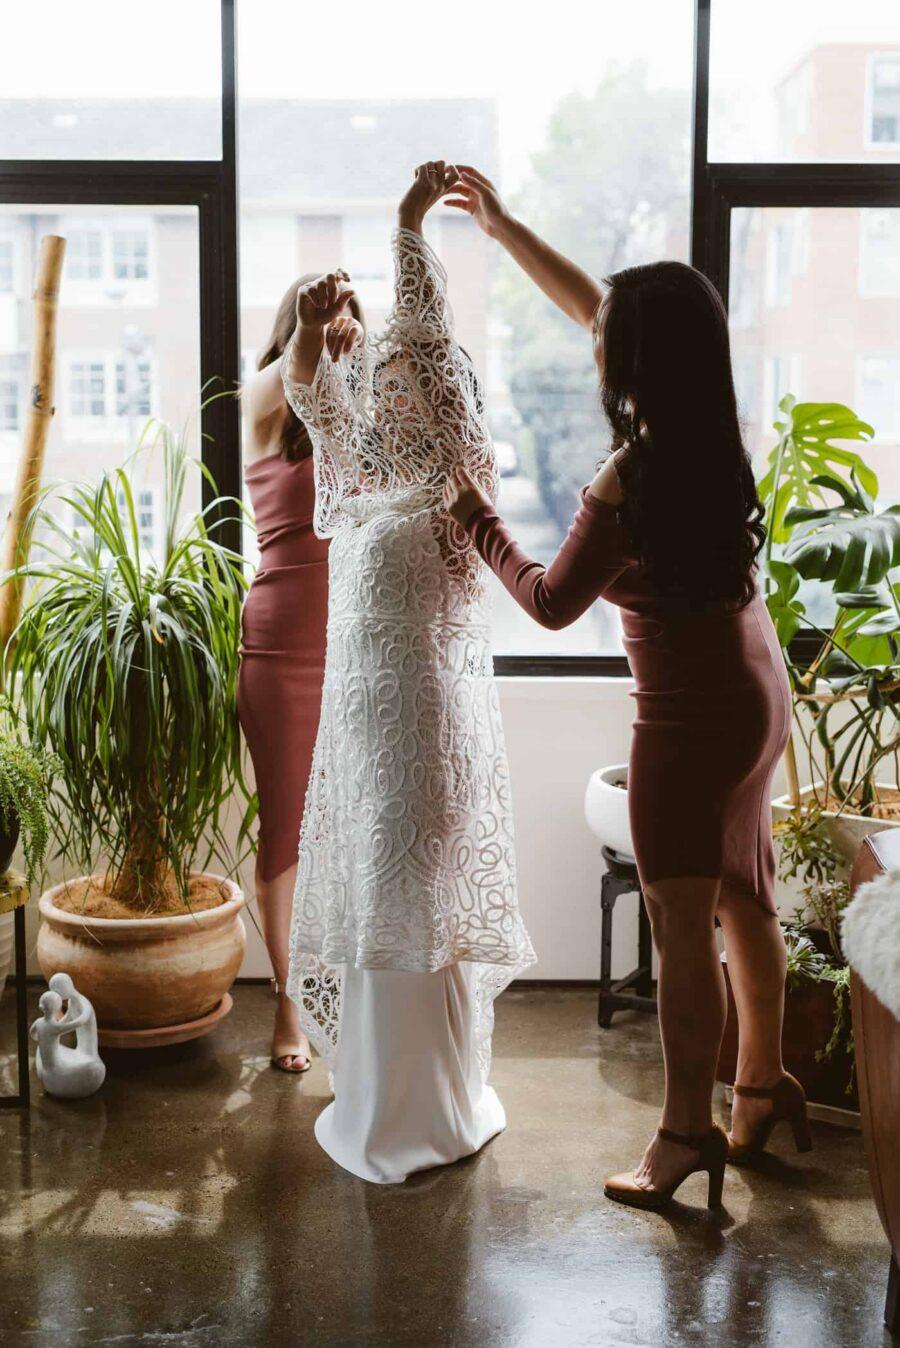 lace overlay wedding dress by Rue de Seine